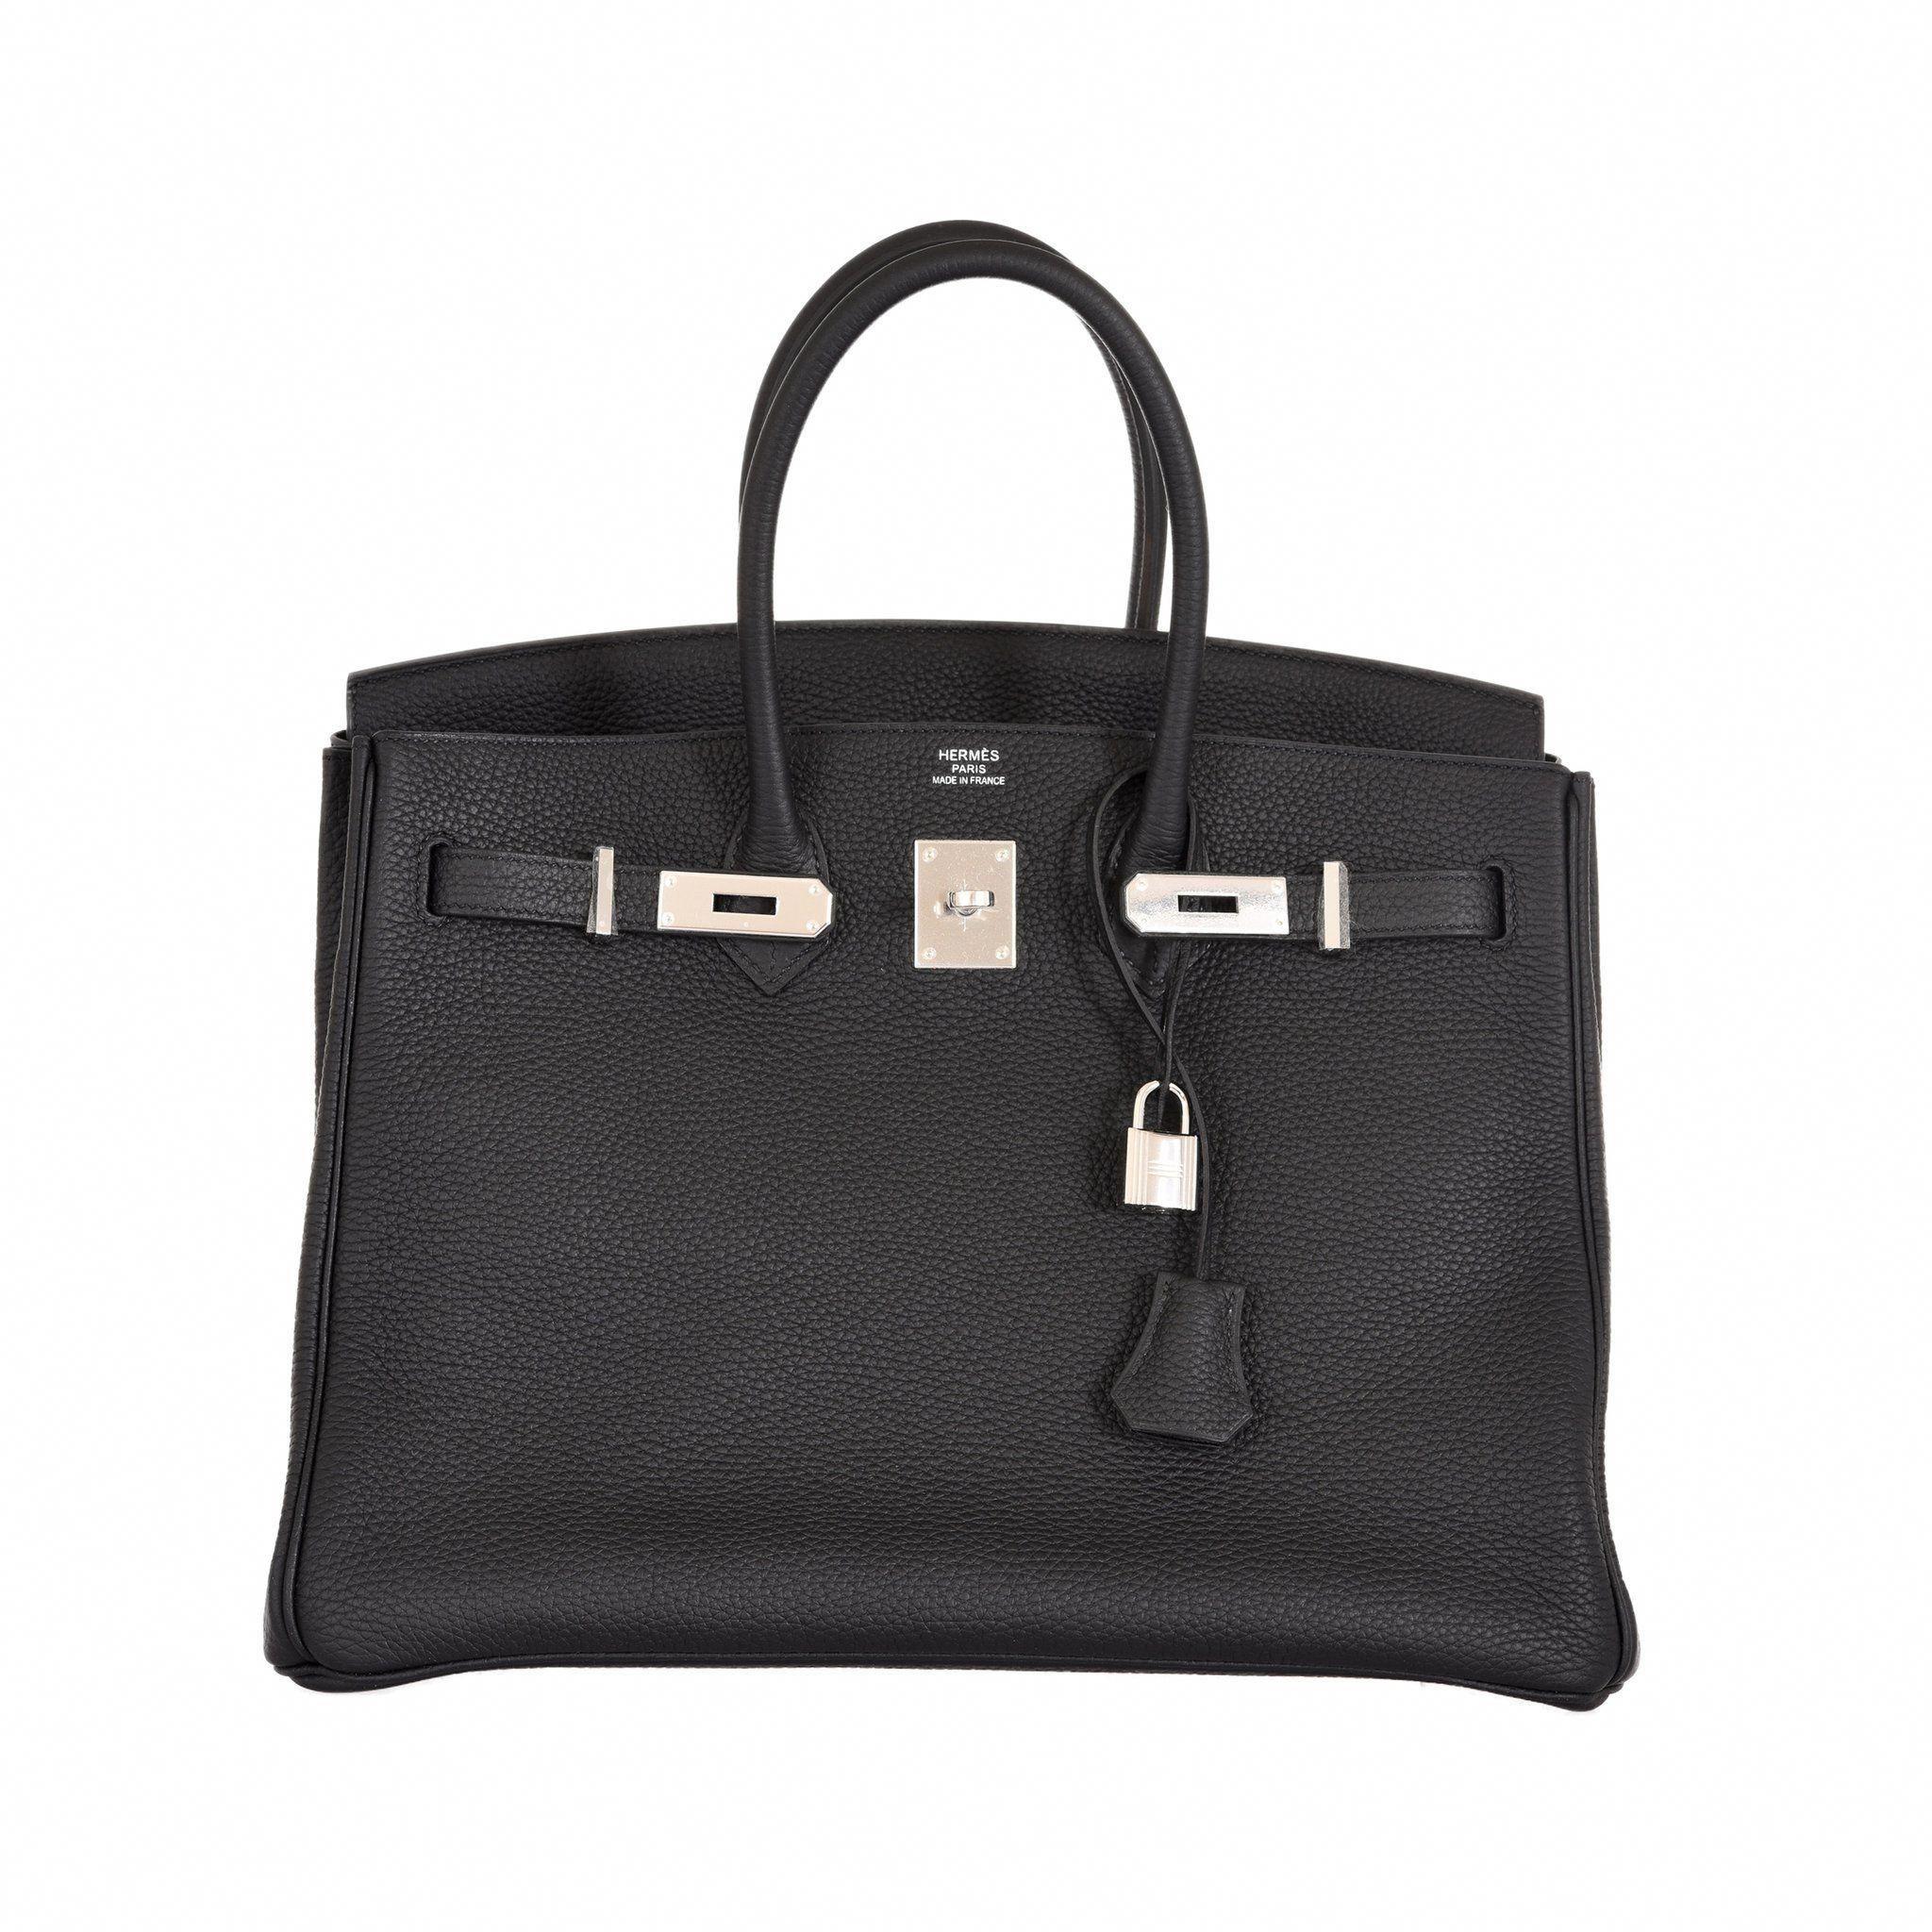 71a6ee80f820 Hermes Birkin 35 Black Togo Palladium Hardware-Birkin-JaneFinds   Hermeshandbags